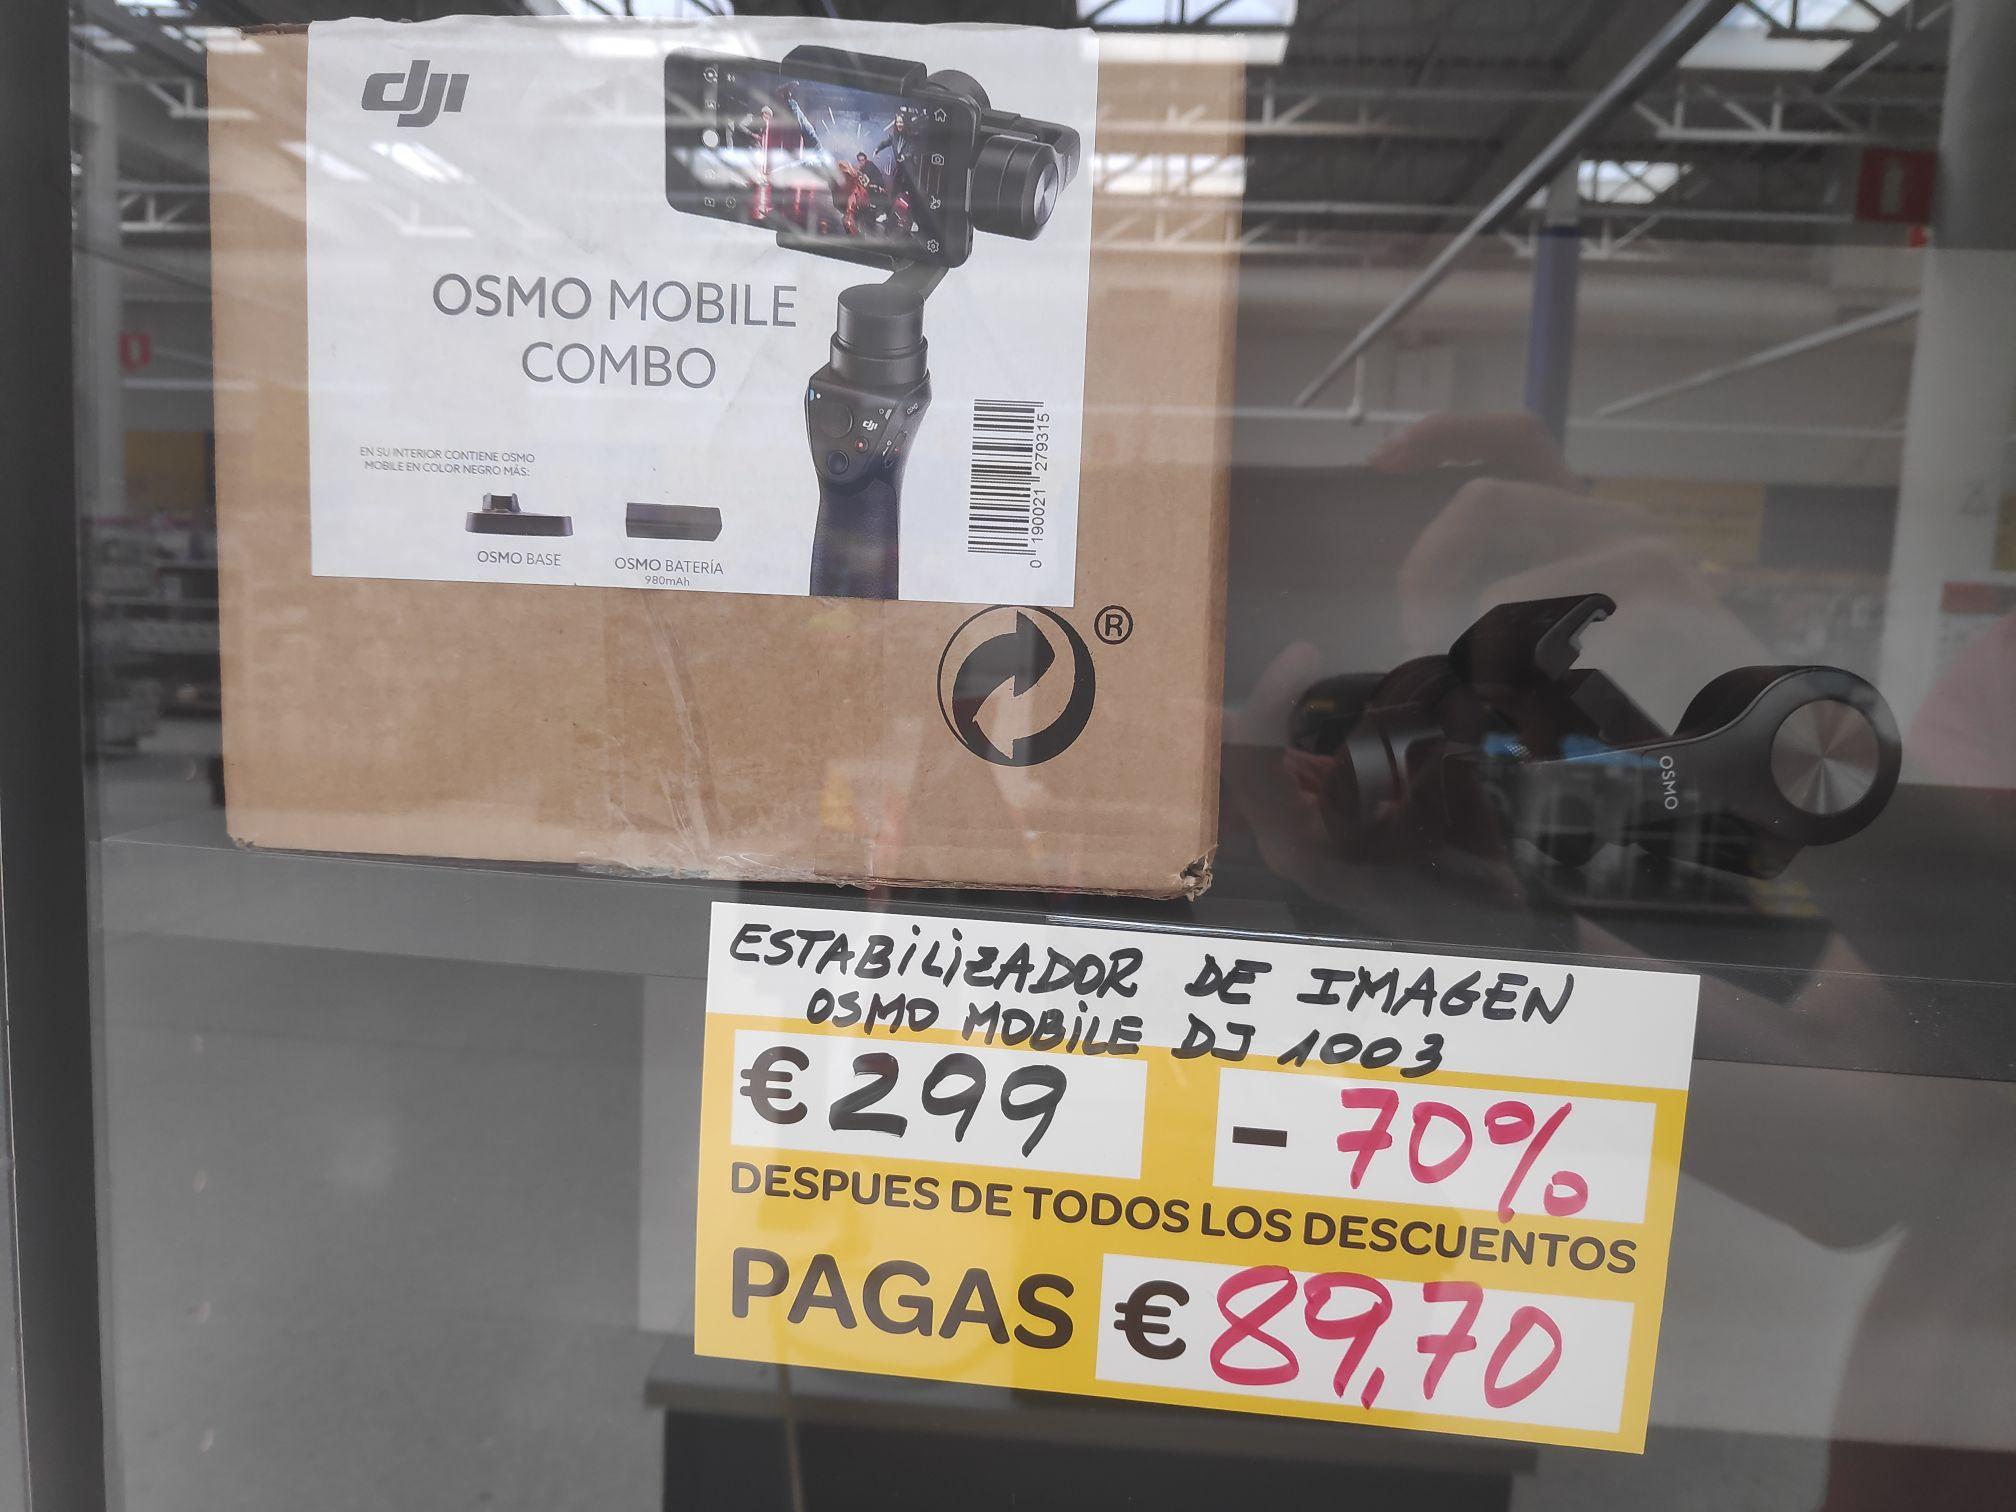 DJI Osmo Mobile - Estabilizador de imagen para Smartphone (Carrefour Outlet Los Rosales)